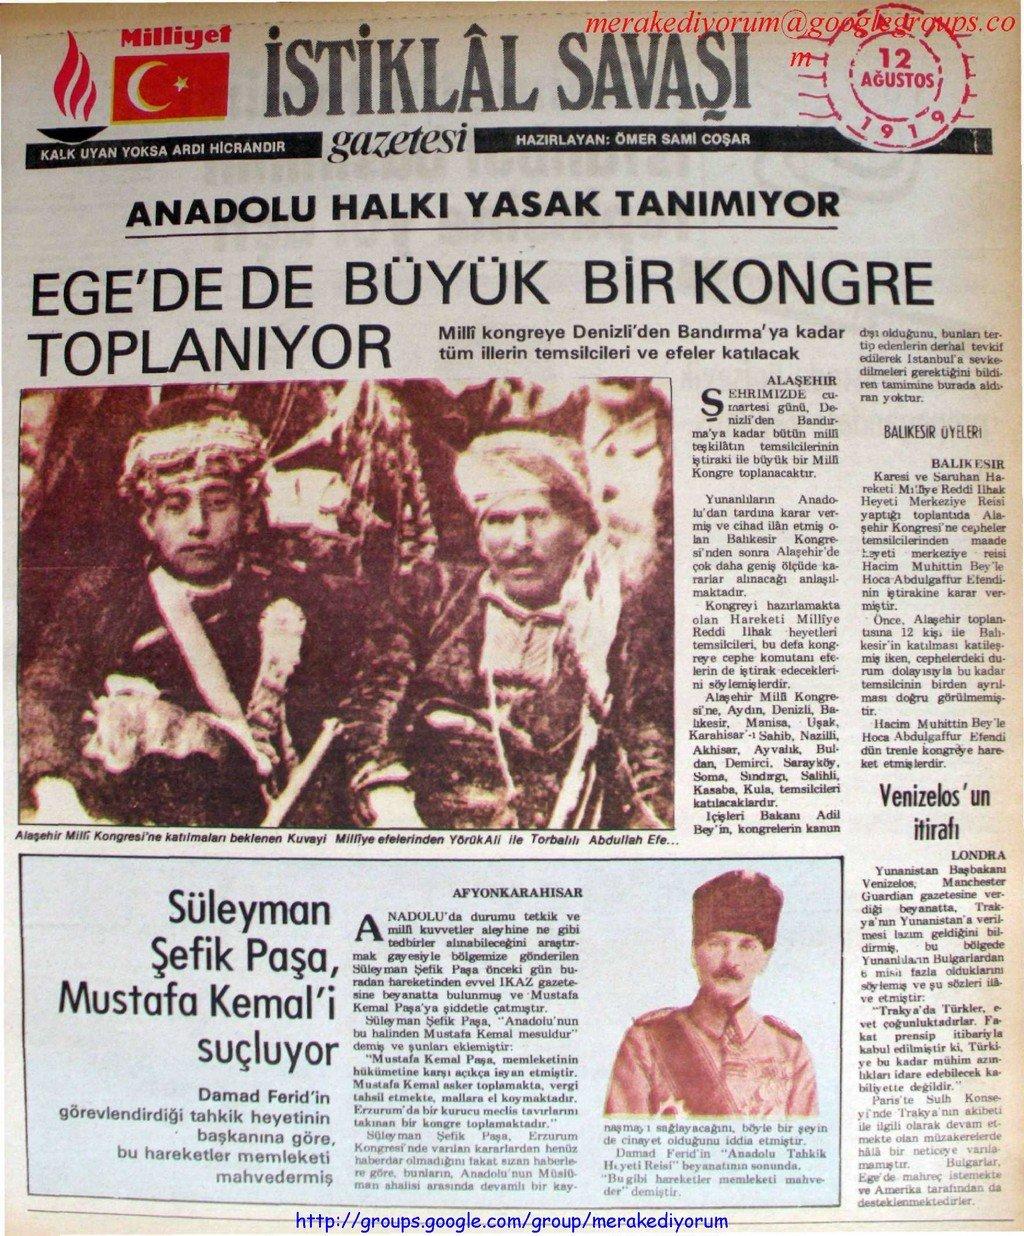 istiklal savaşı gazetesi - 12 ağustos 1919